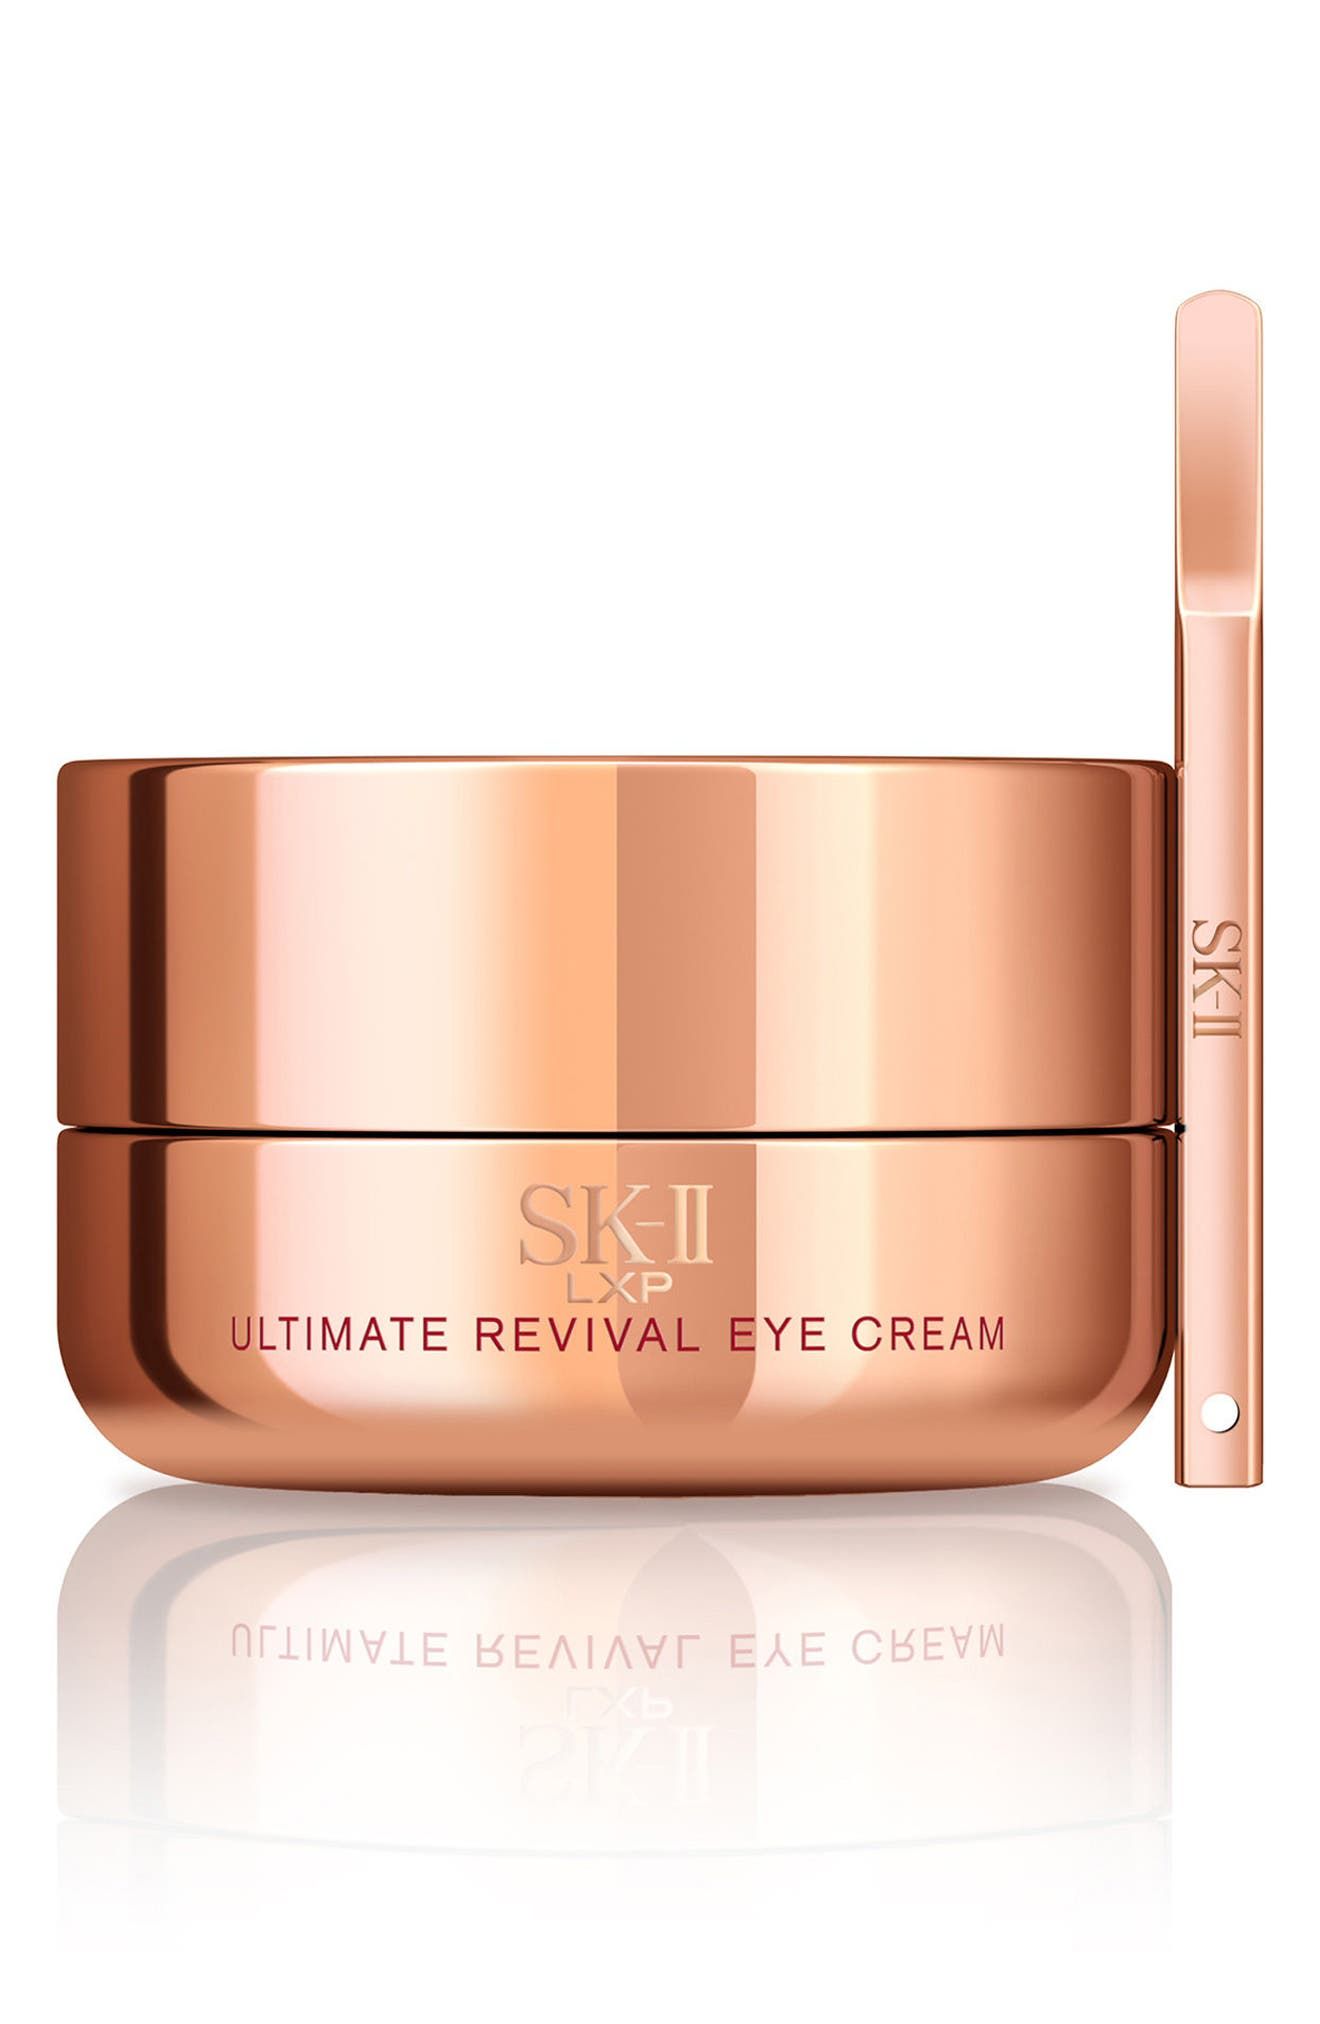 LXP Ultimate Revival Eye Cream,                             Main thumbnail 1, color,                             No Color